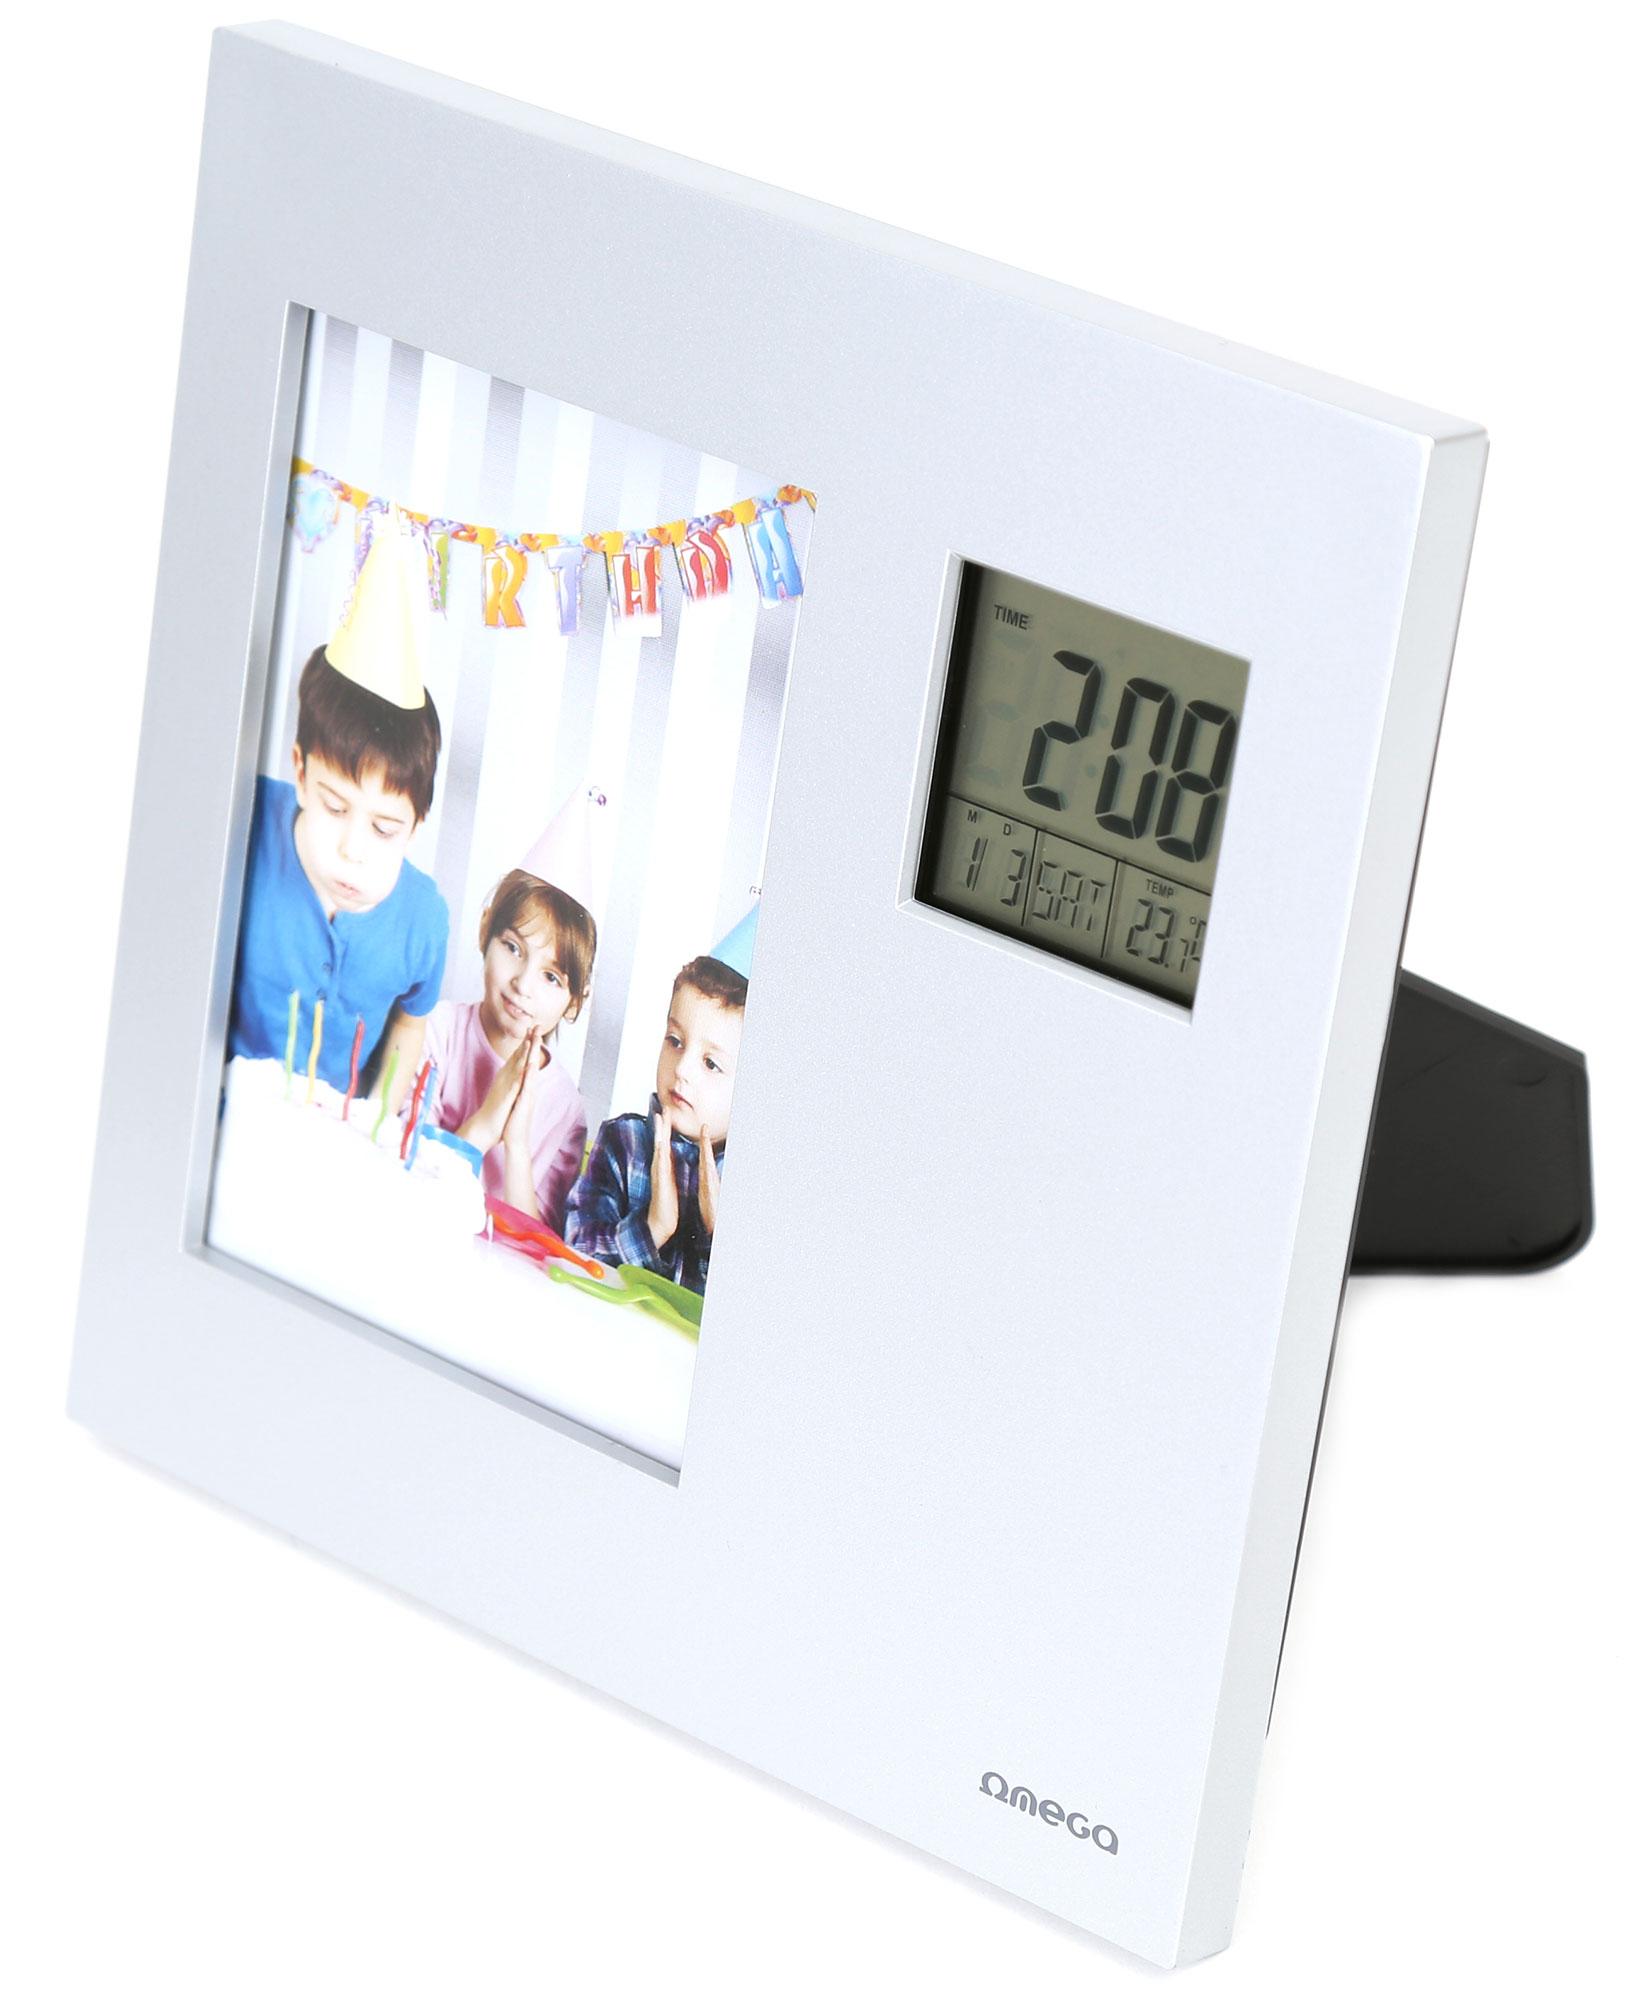 электронные рамки для фото с часами александр